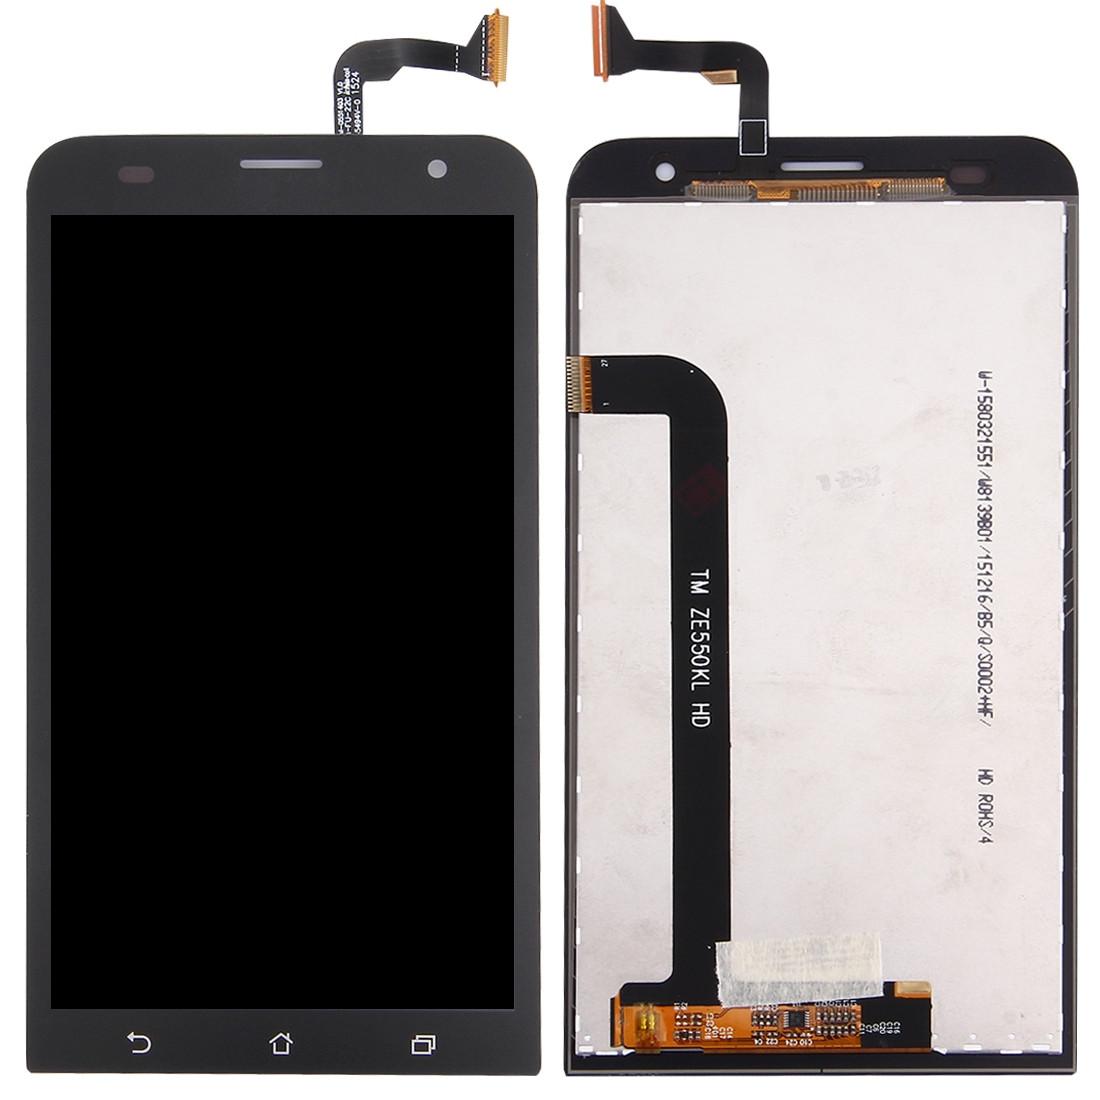 IPartsAcheter Pour Asus ZenFone 2 Laser ZE550KL LCD Ecran Tactile Digitizer Assemblee